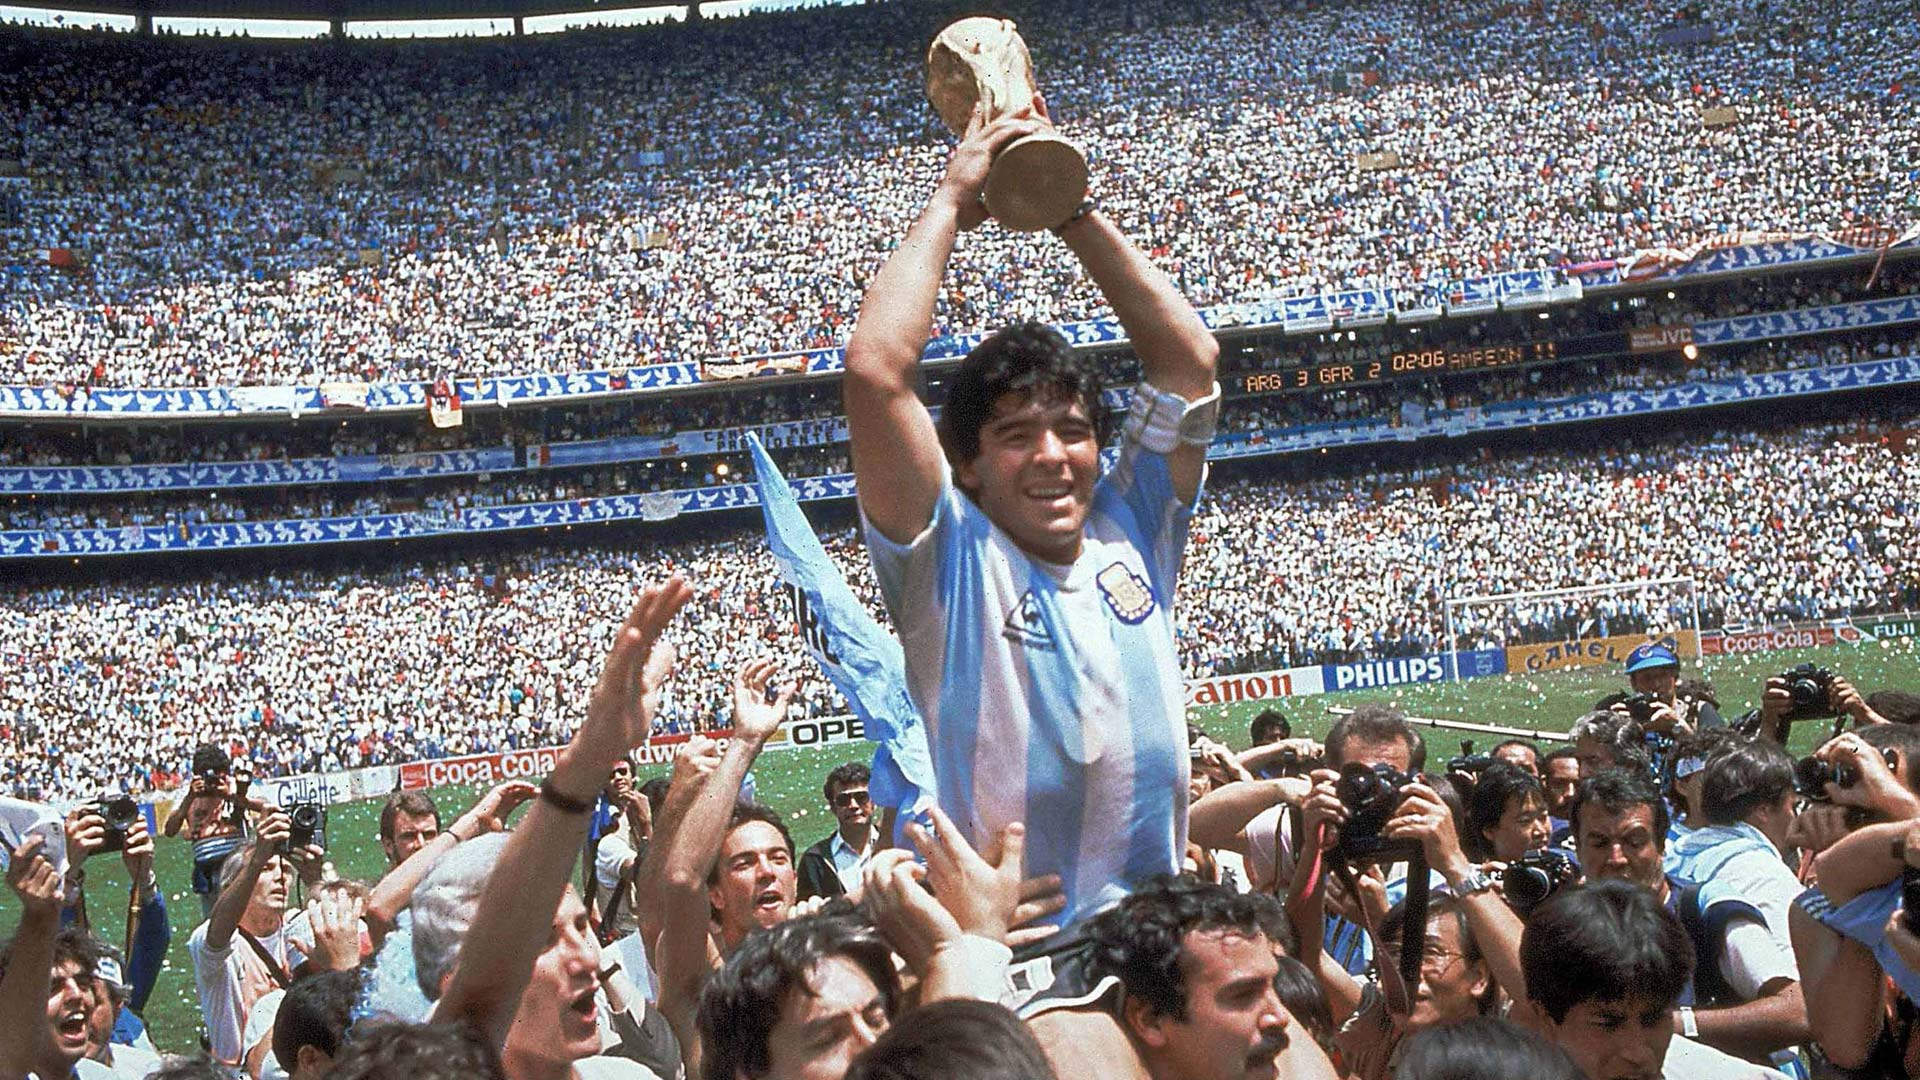 Diego-Maradona-061214-FTR-AP.jpg